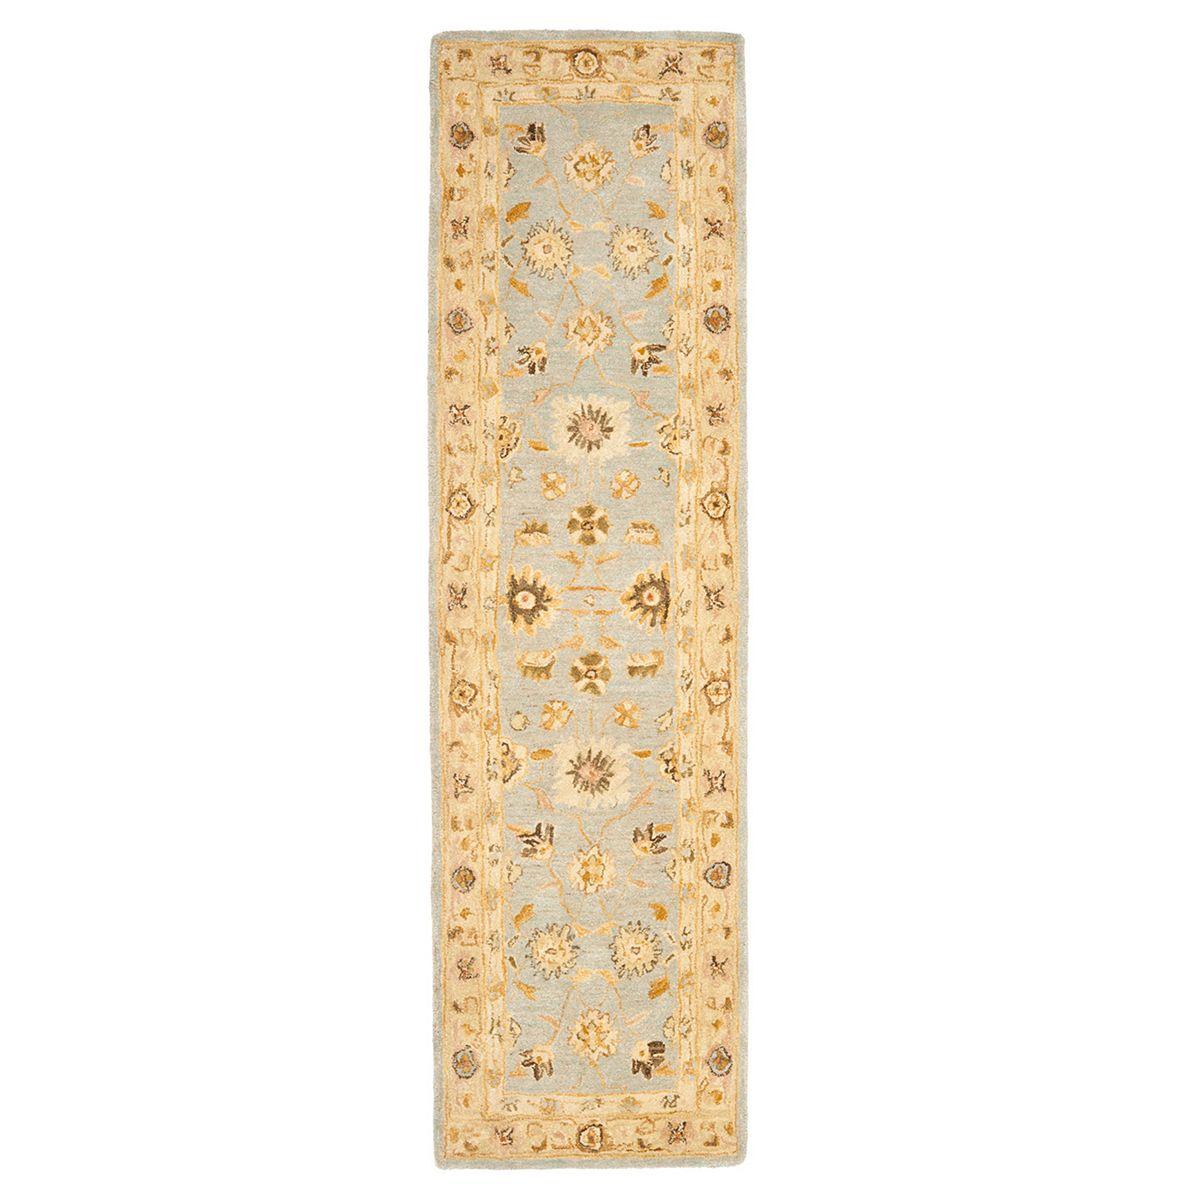 Safavieh Anatolia Rochelle Framed Floral Wool Rug  Light Blue Sage qb2kF